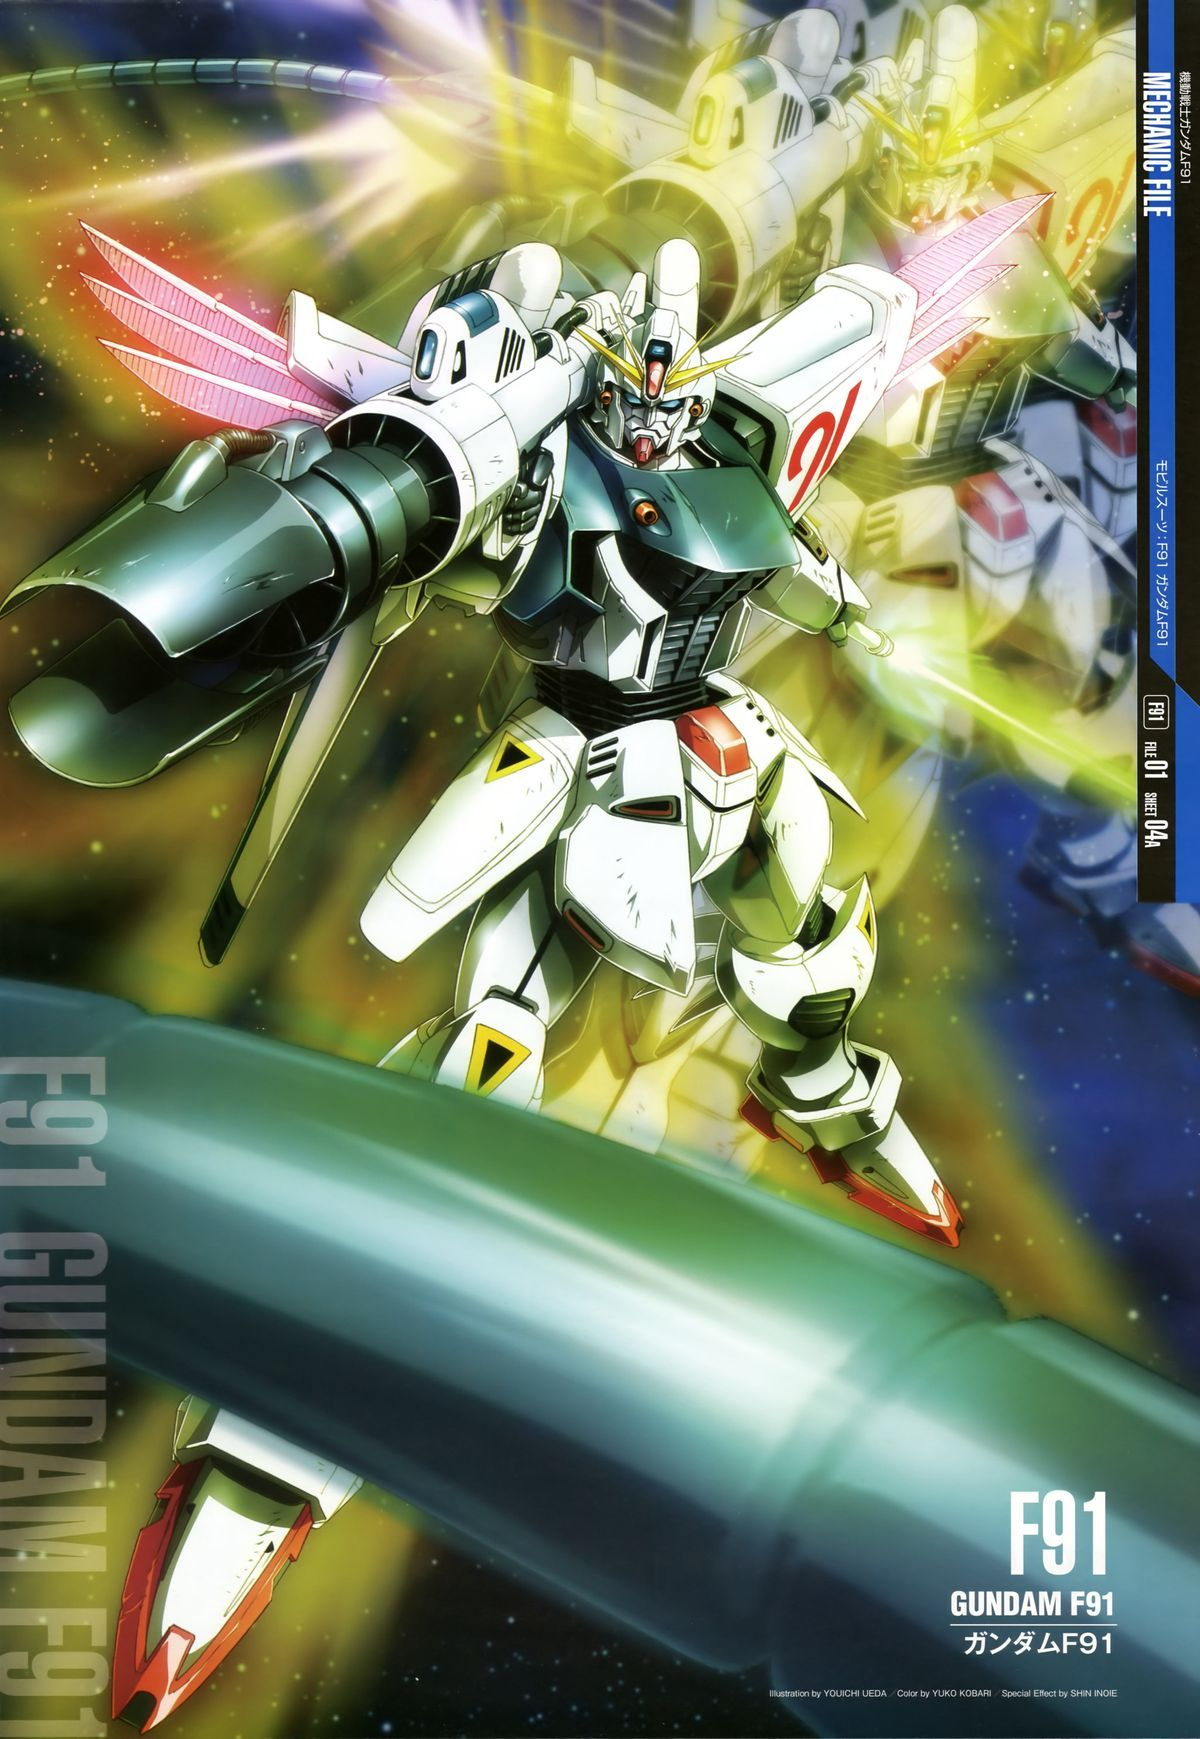 Mobile Suit Gundam F91 F91 Gundam F91 ガンダムf91 ゲーム